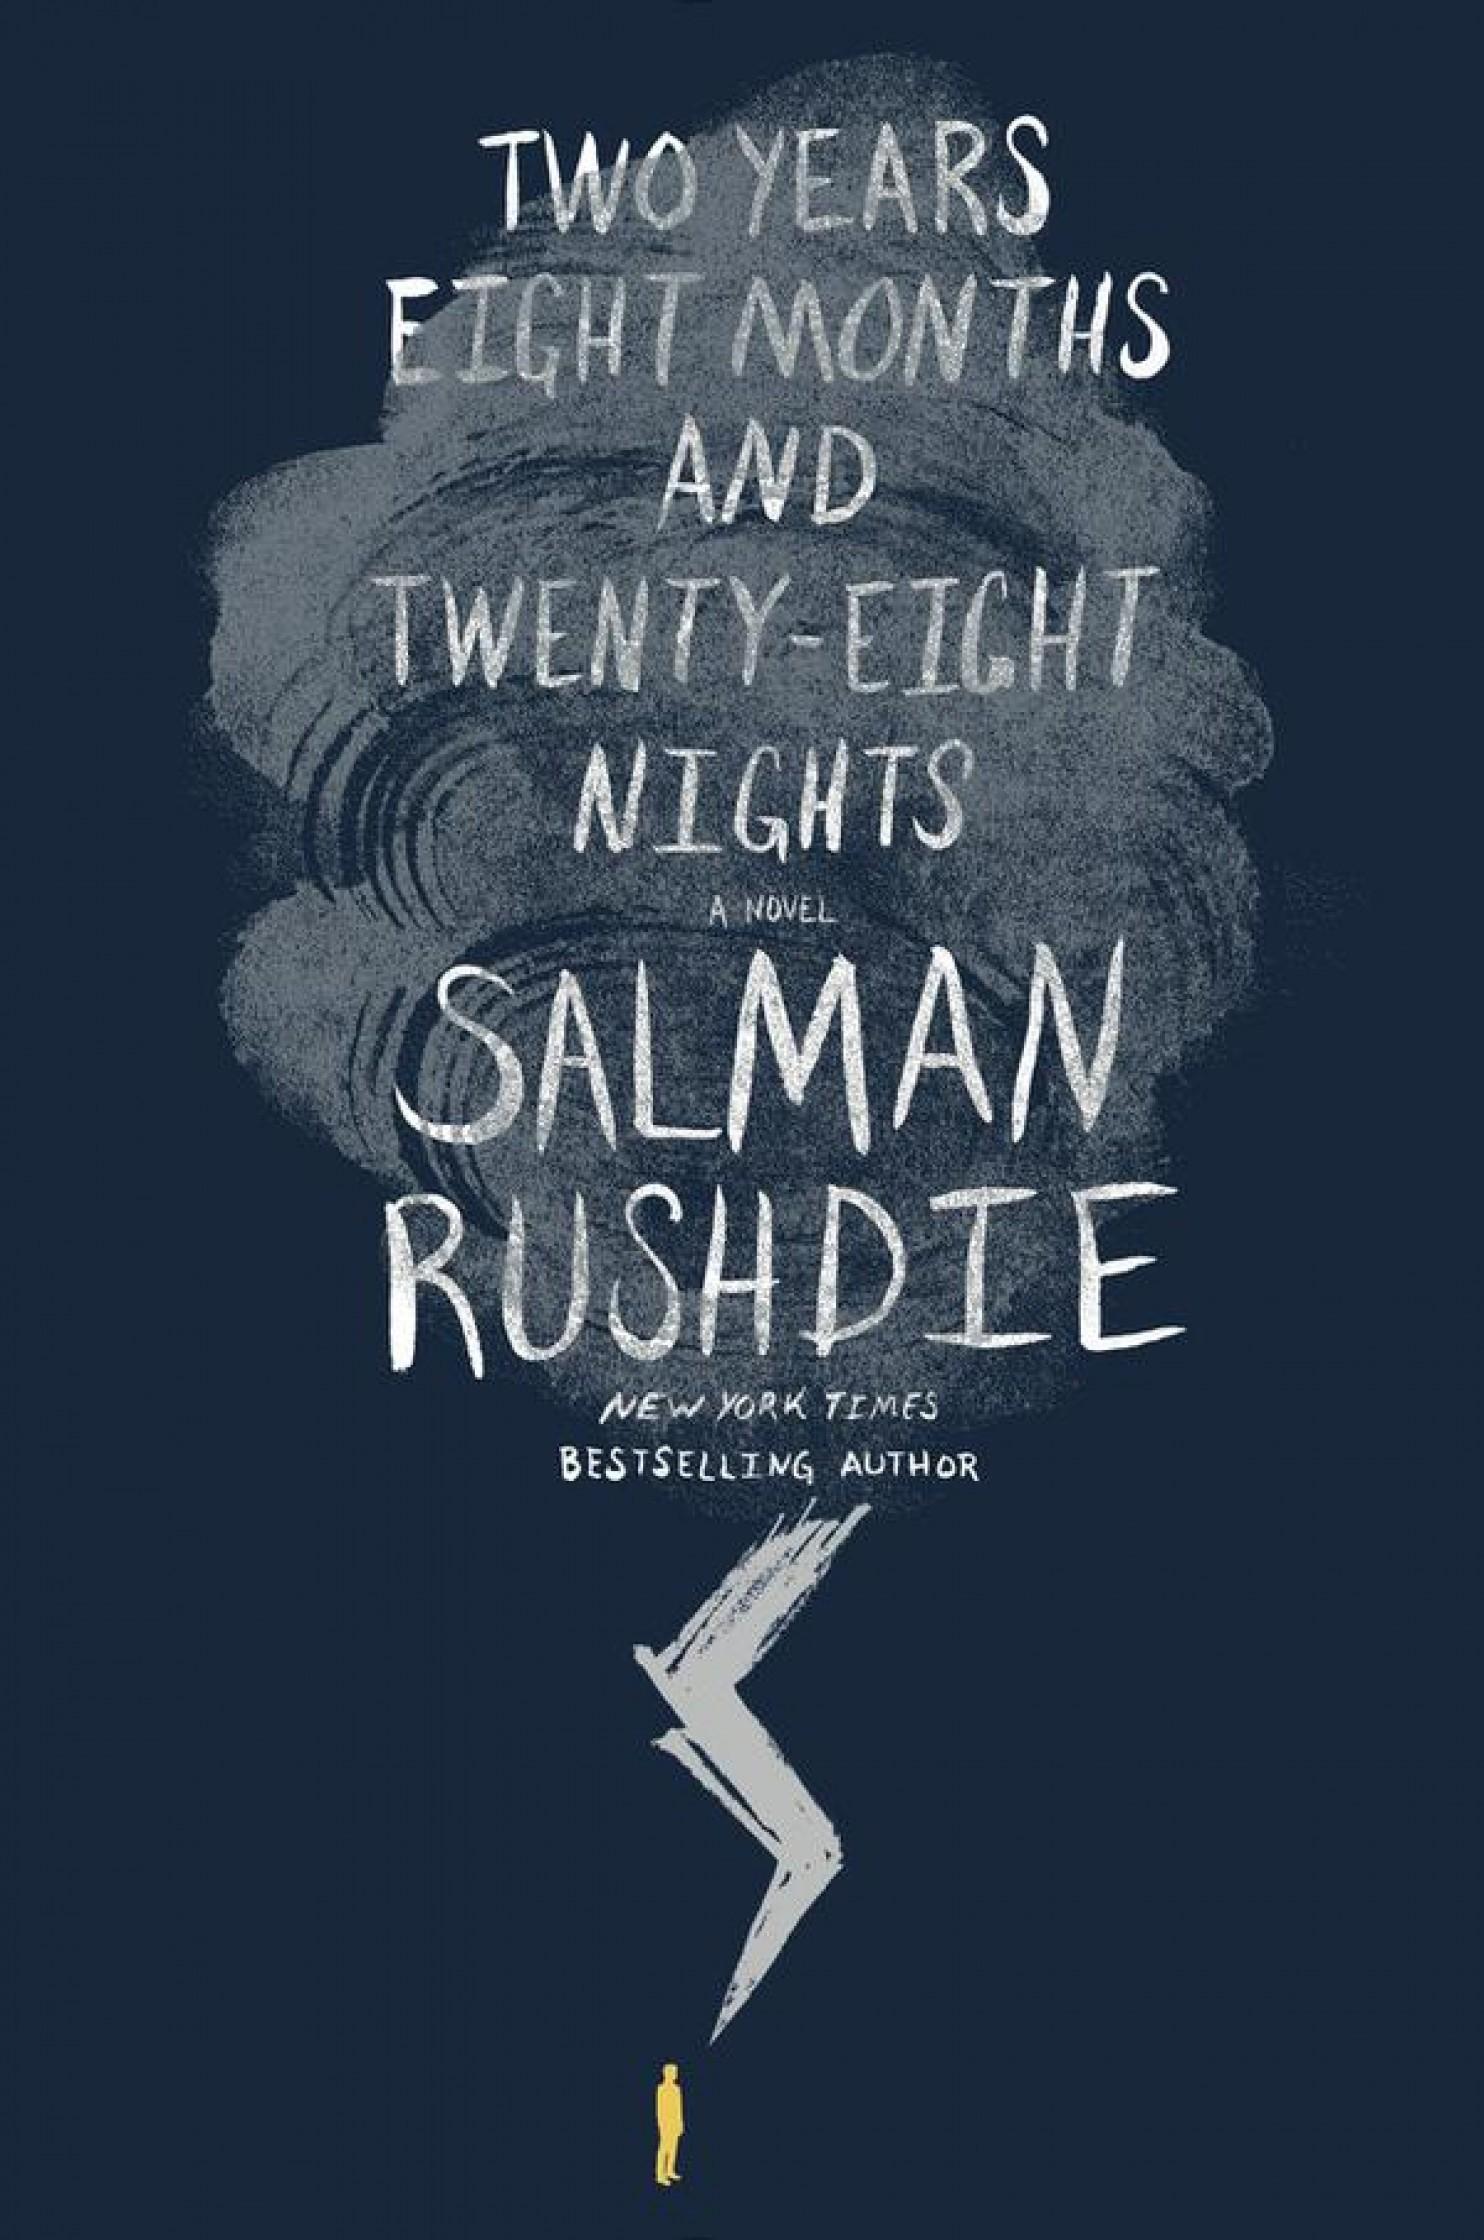 Essays Written By Salman Rushdie